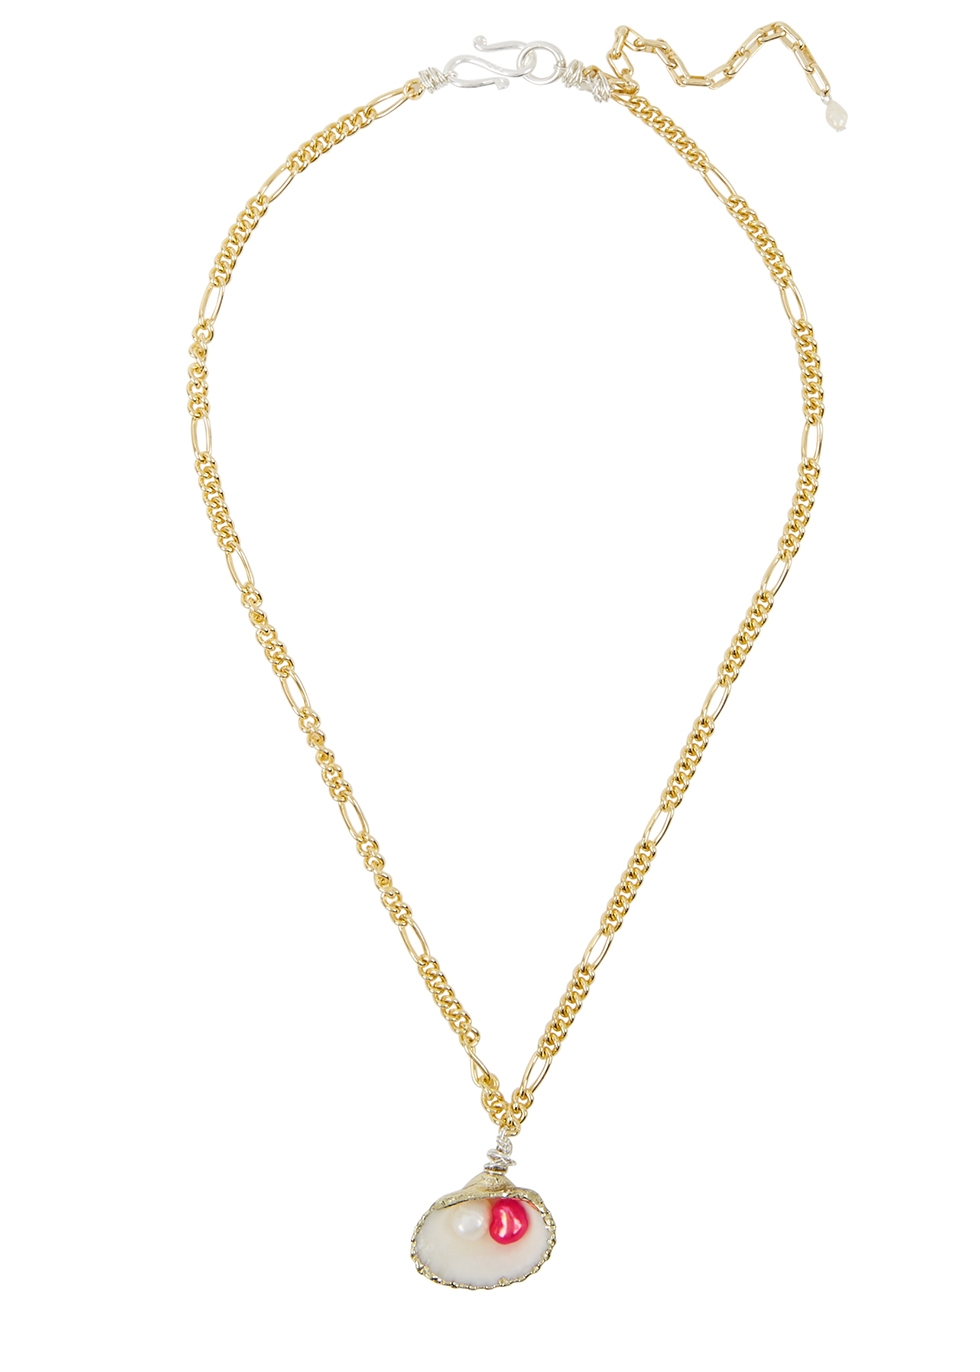 Drop It Like It's Hot gold-plated necklace - WALD Berlin